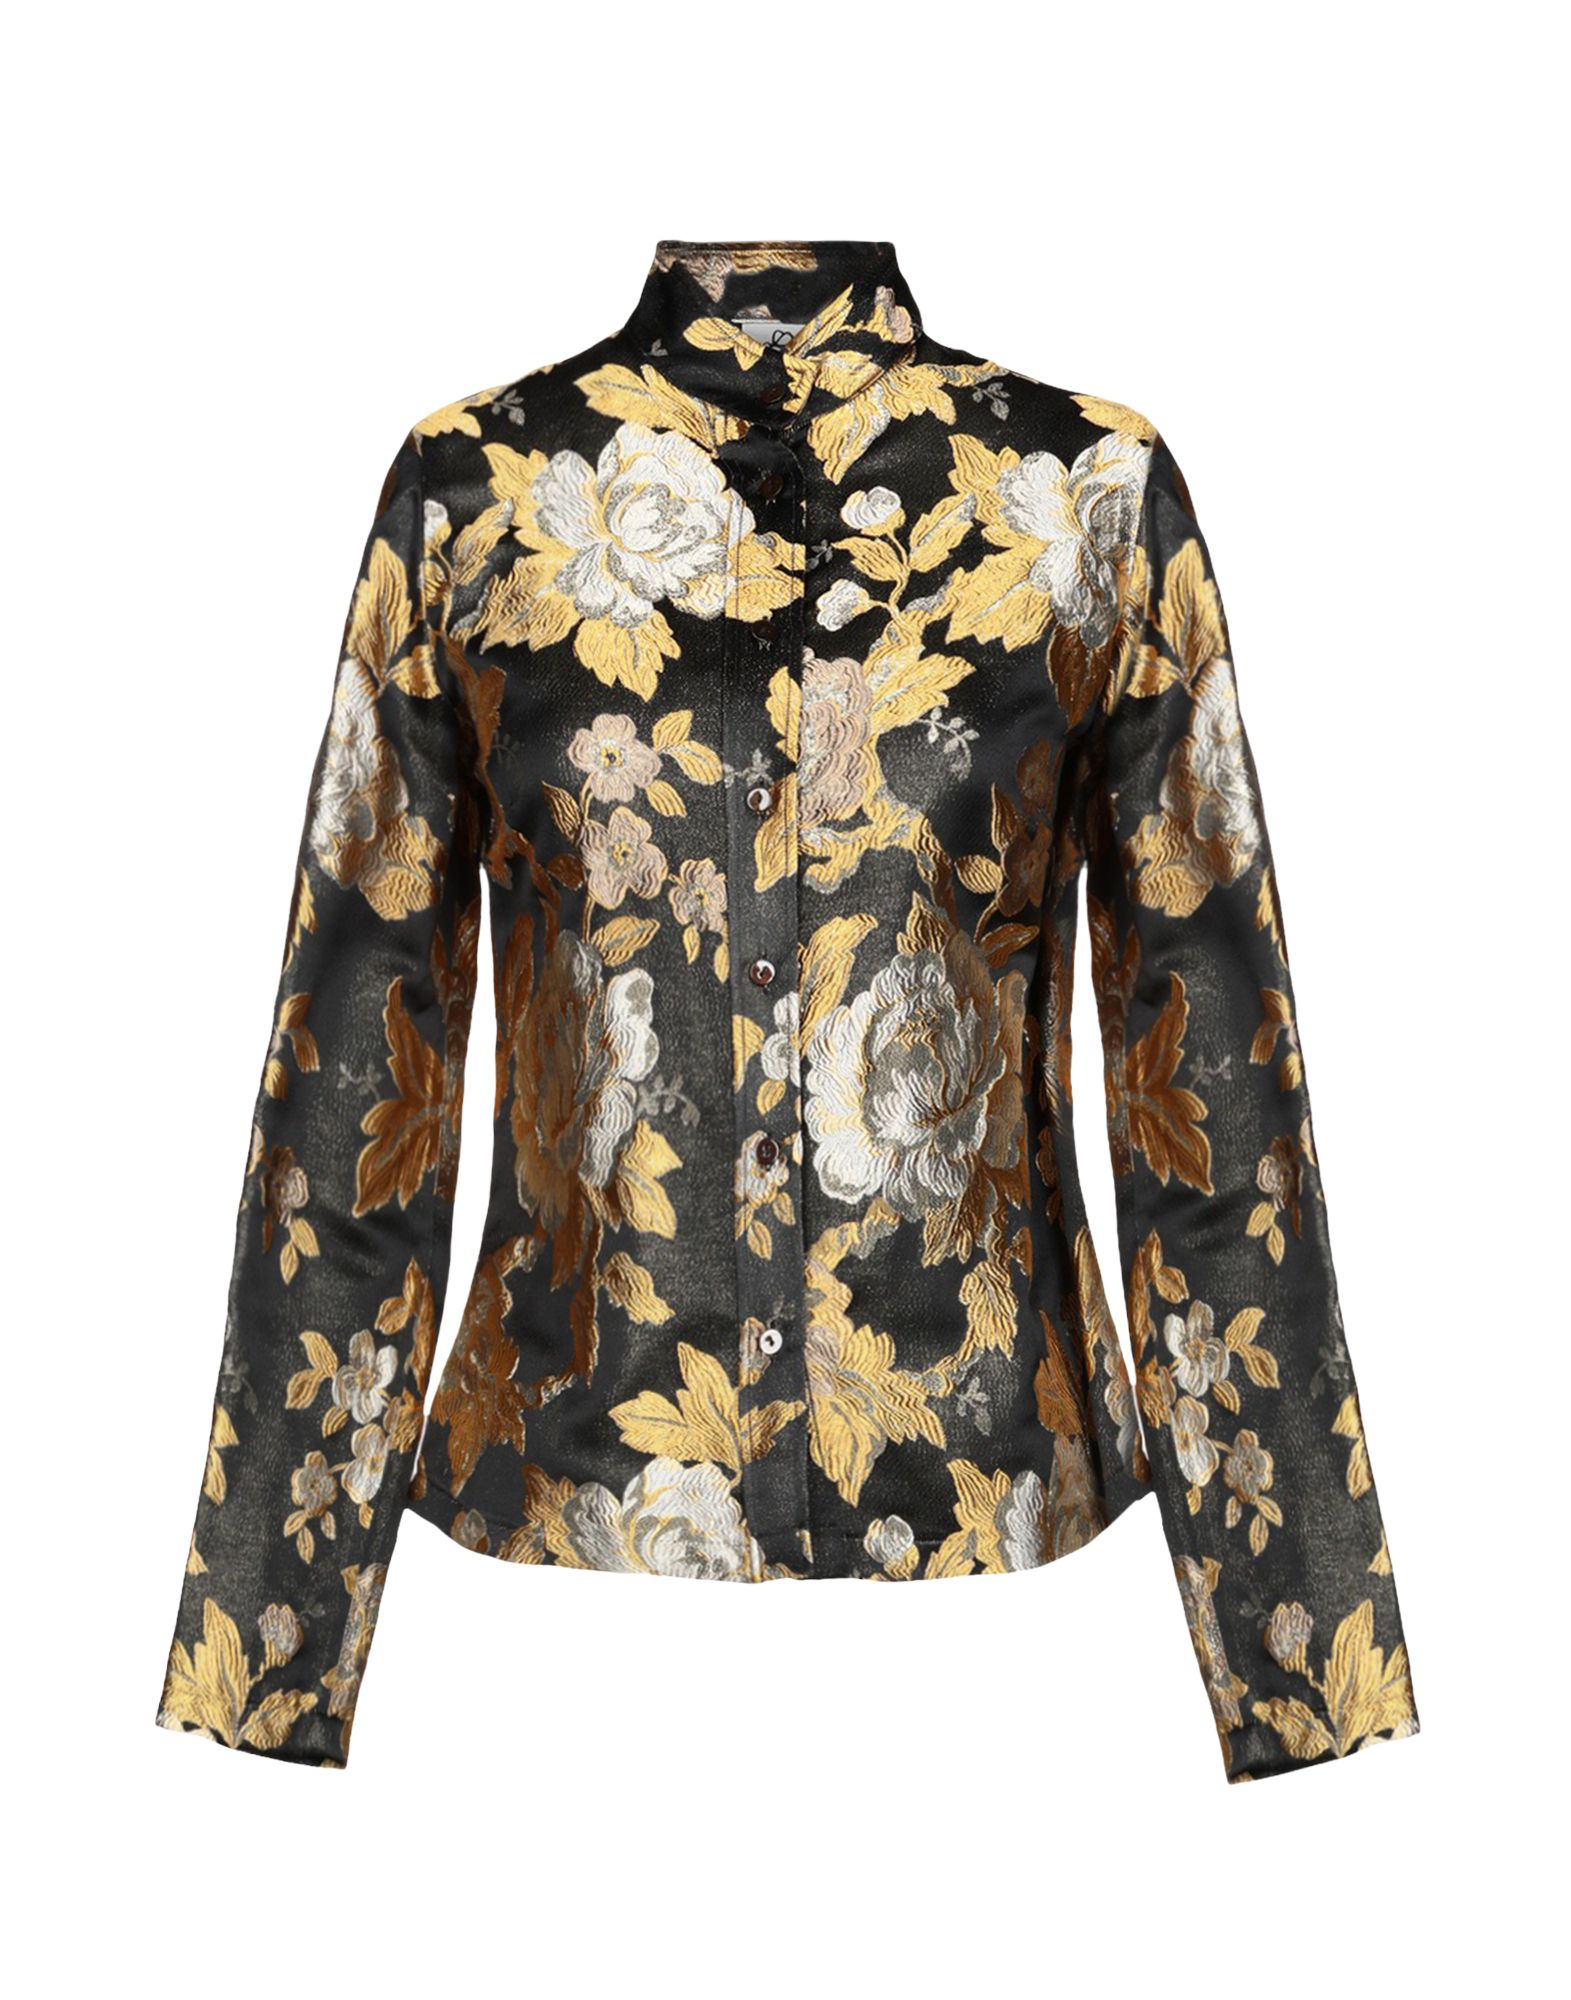 Camicie E bluse A Fiori Mosca donna - 38773872QG 38773872QG 38773872QG da3